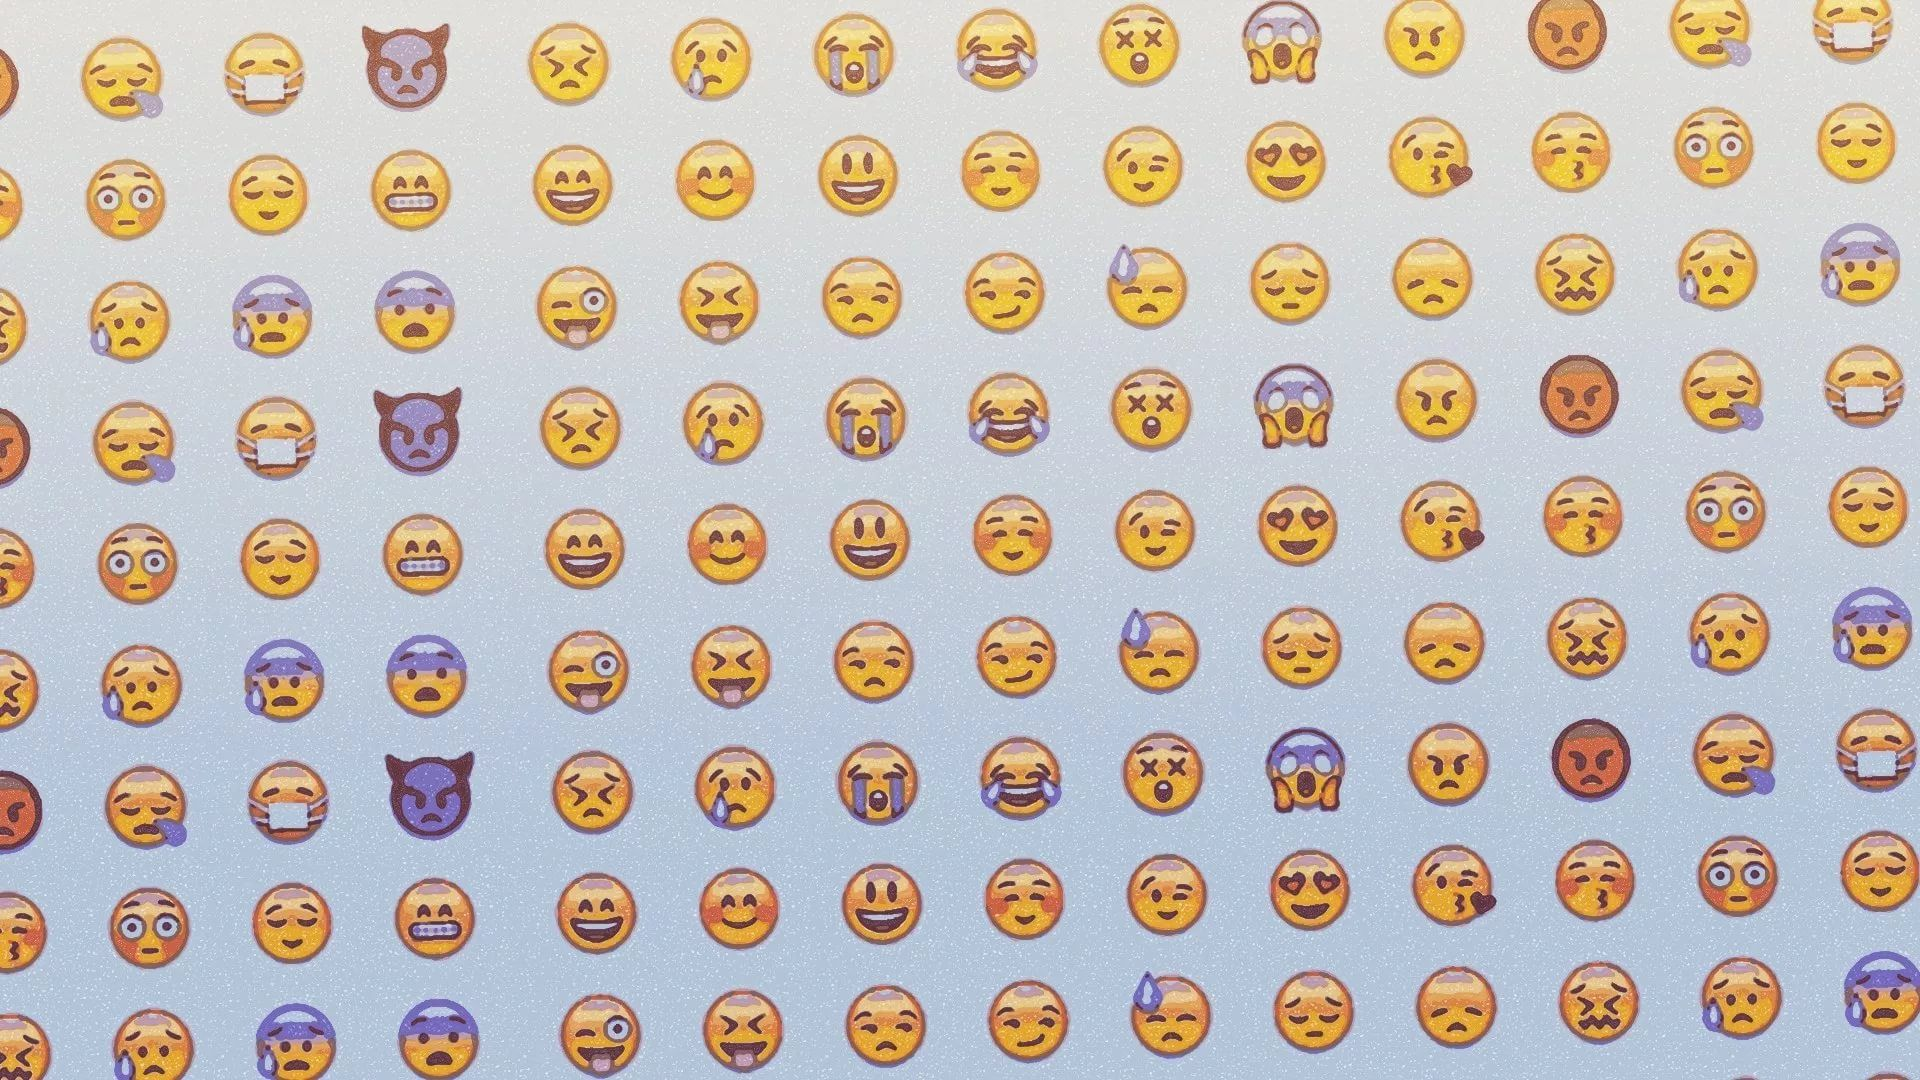 Cute Emoji full hd wallpaper